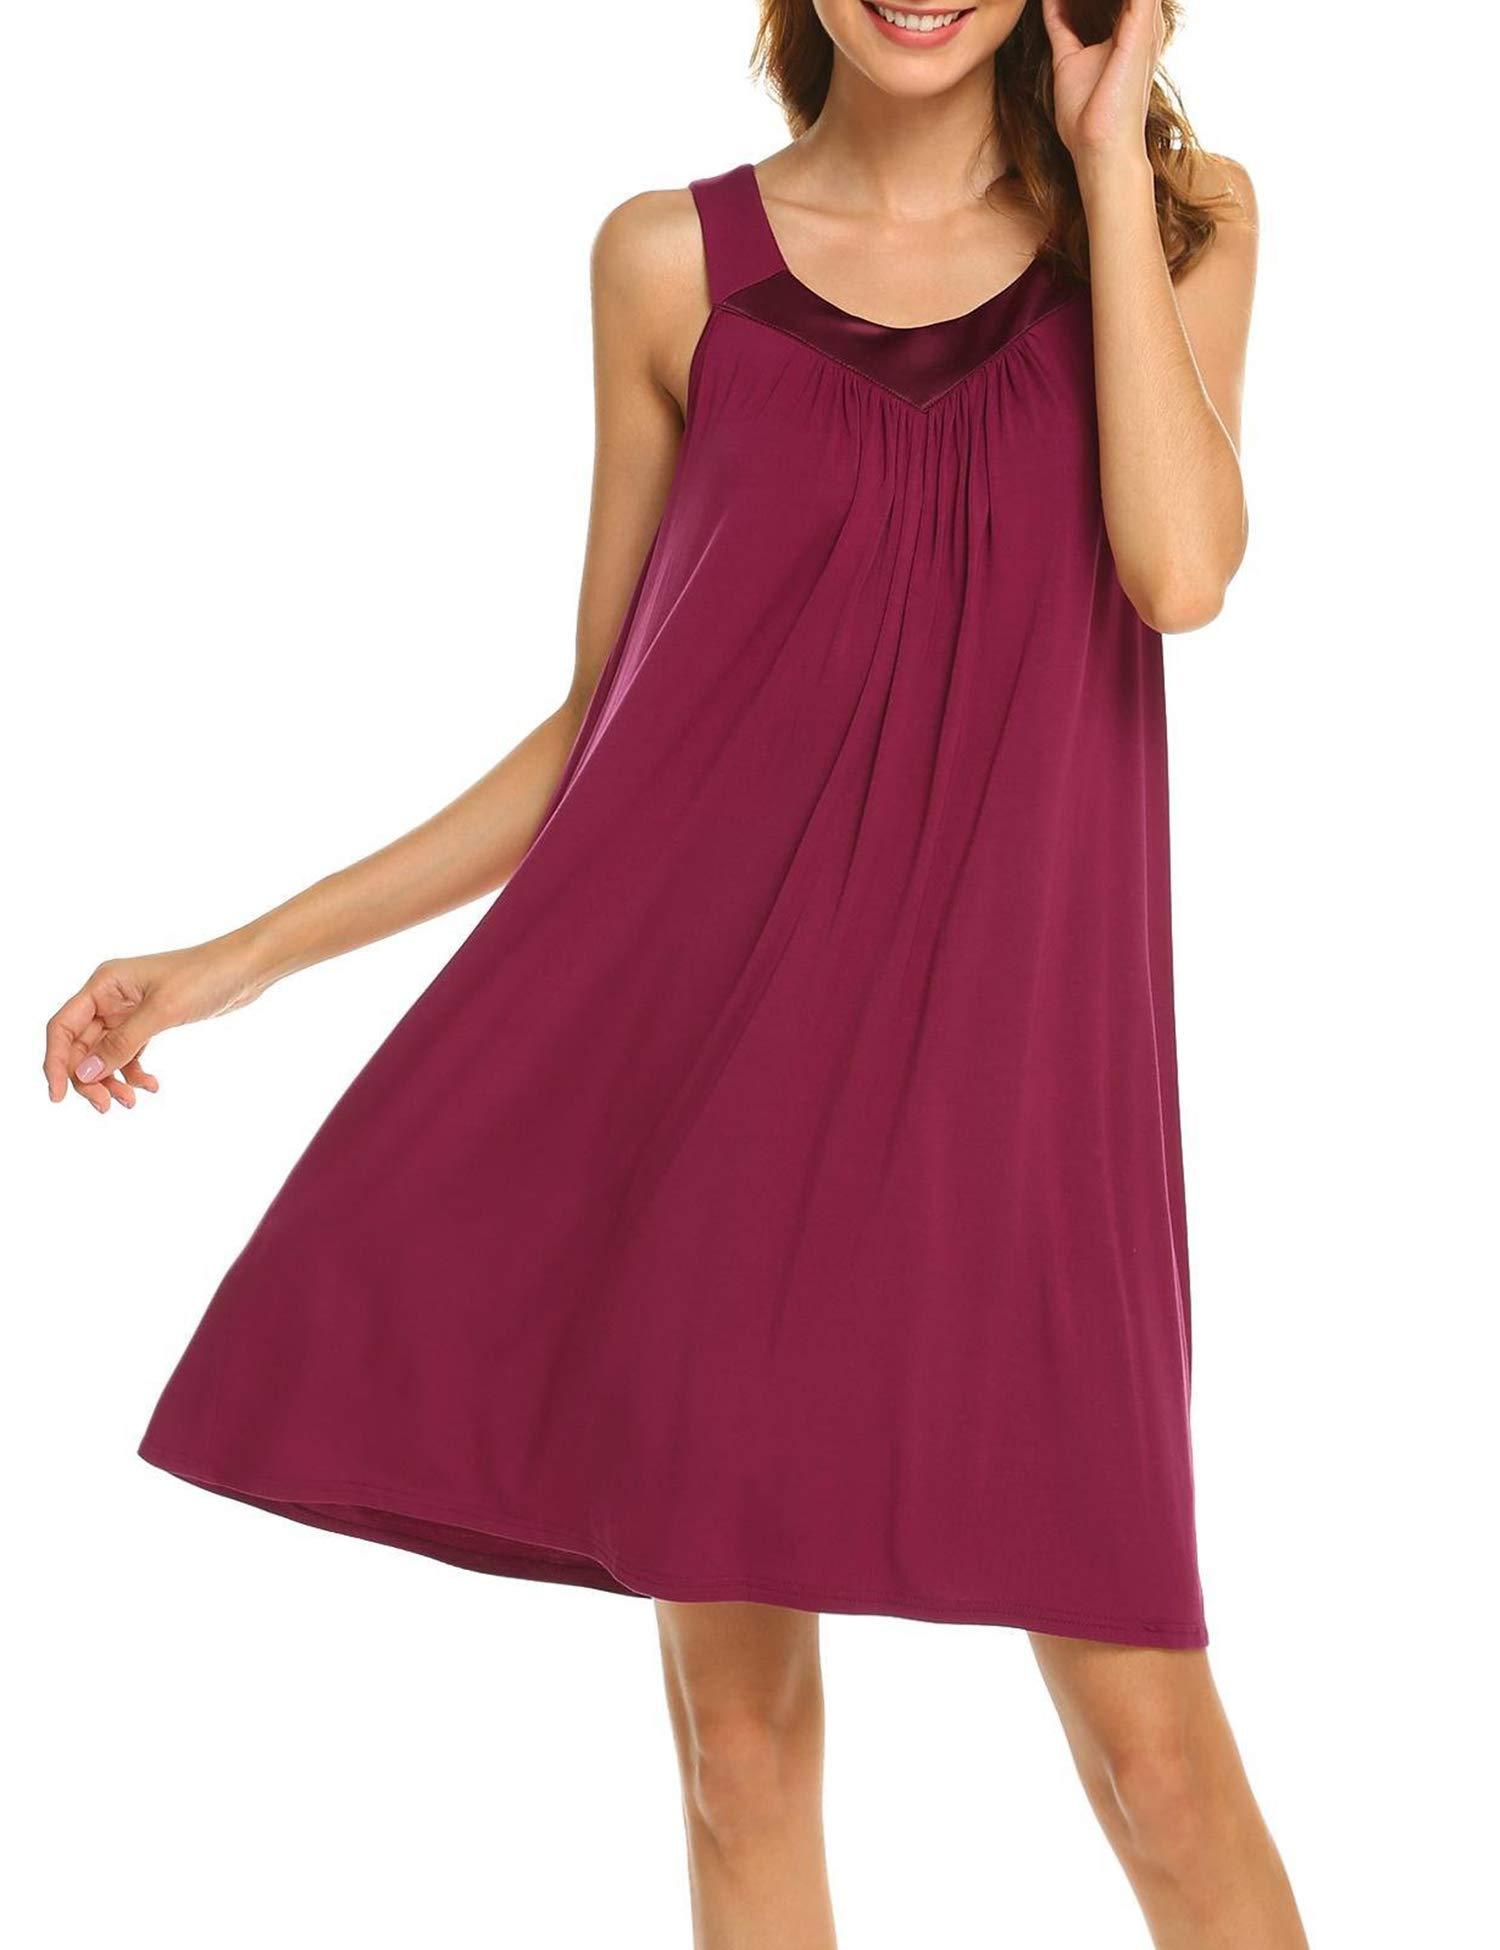 Bloggerlove Cotton Nightgowns for Women V Neck Sleepwear Night Shirts Sleeveless Sleep Dress S-XXL